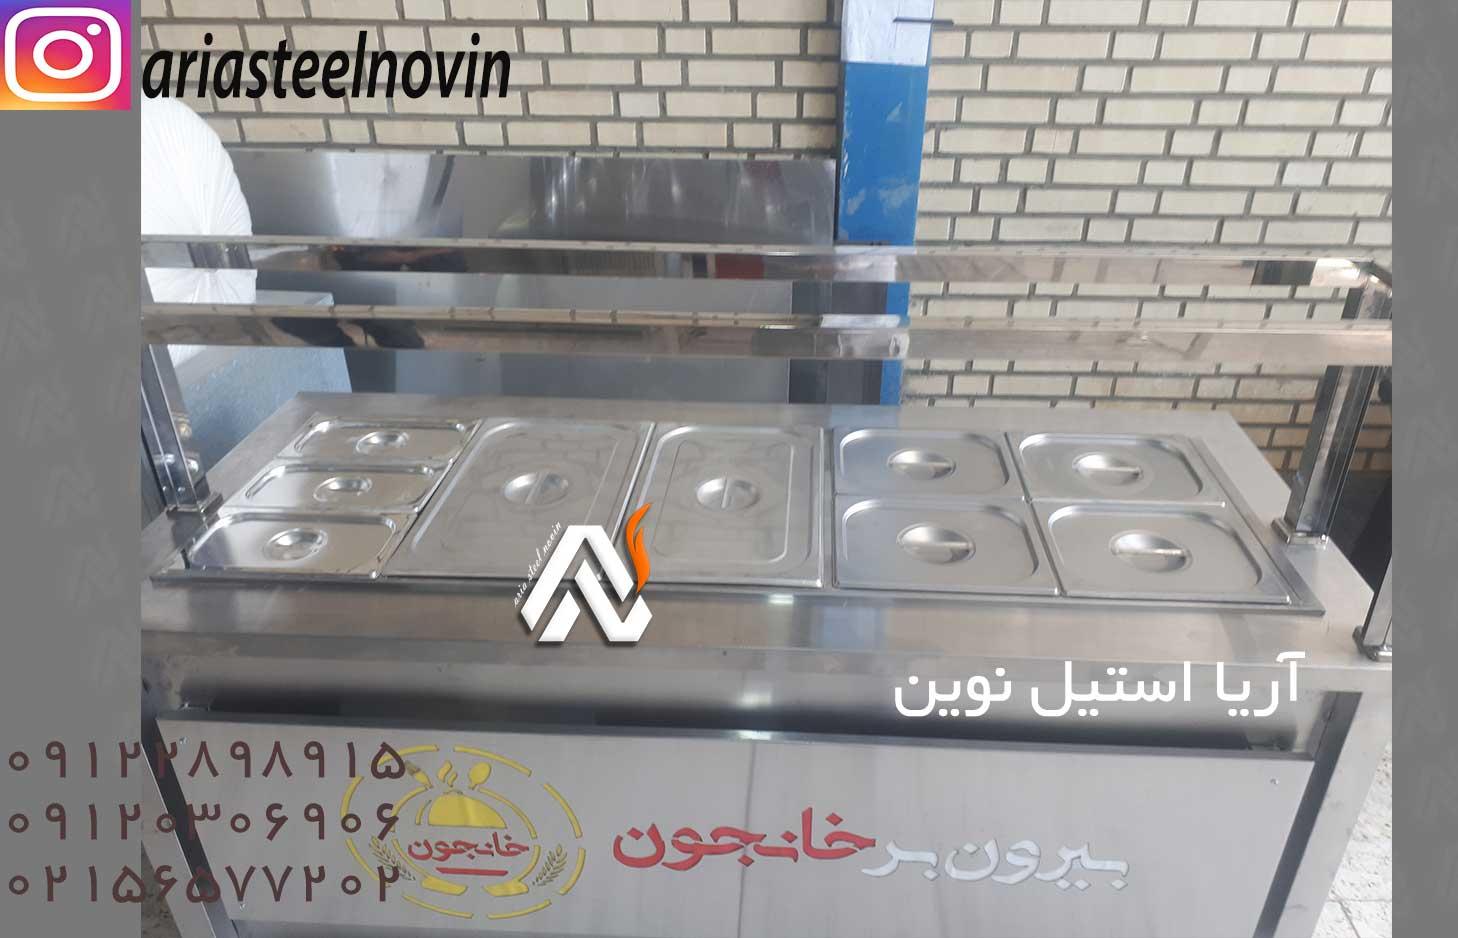 hot-counter-food